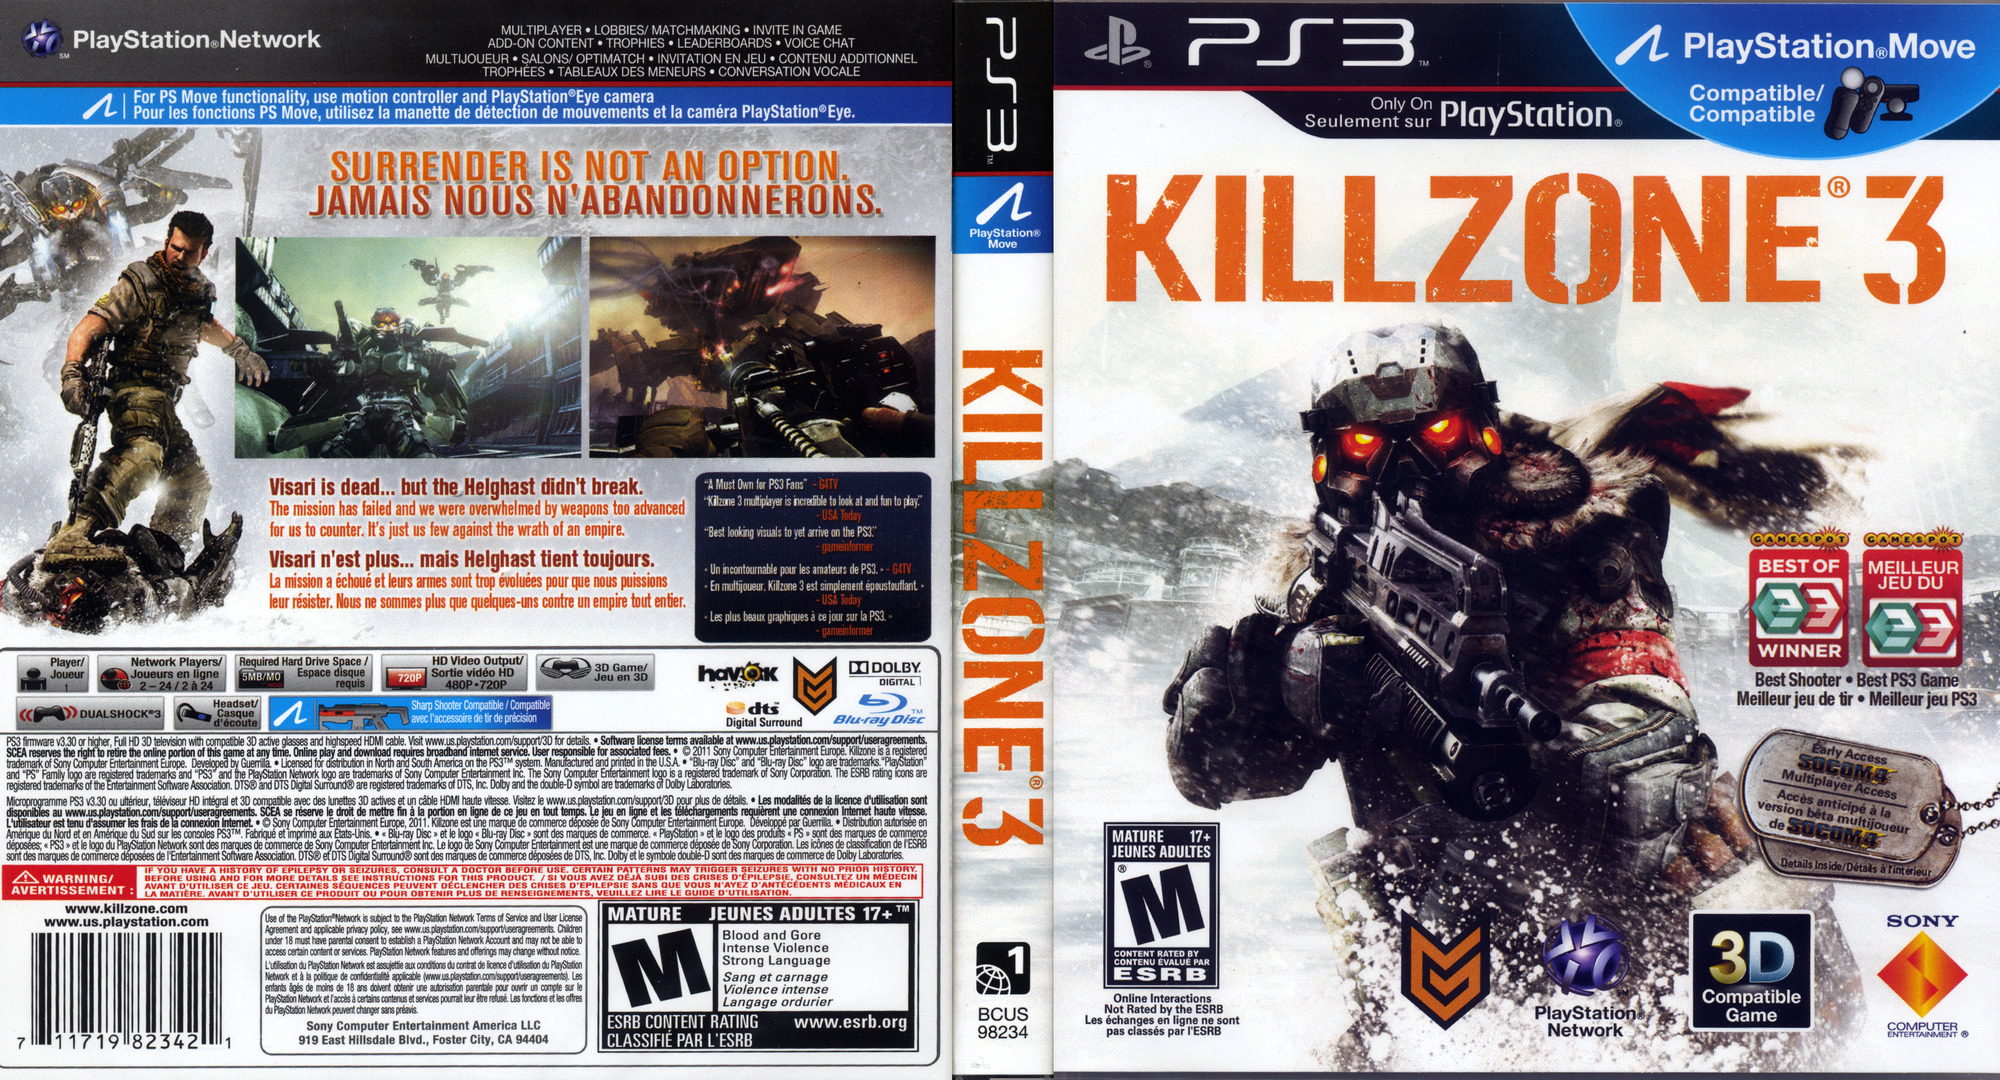 BCUS98234 - Killzone 3